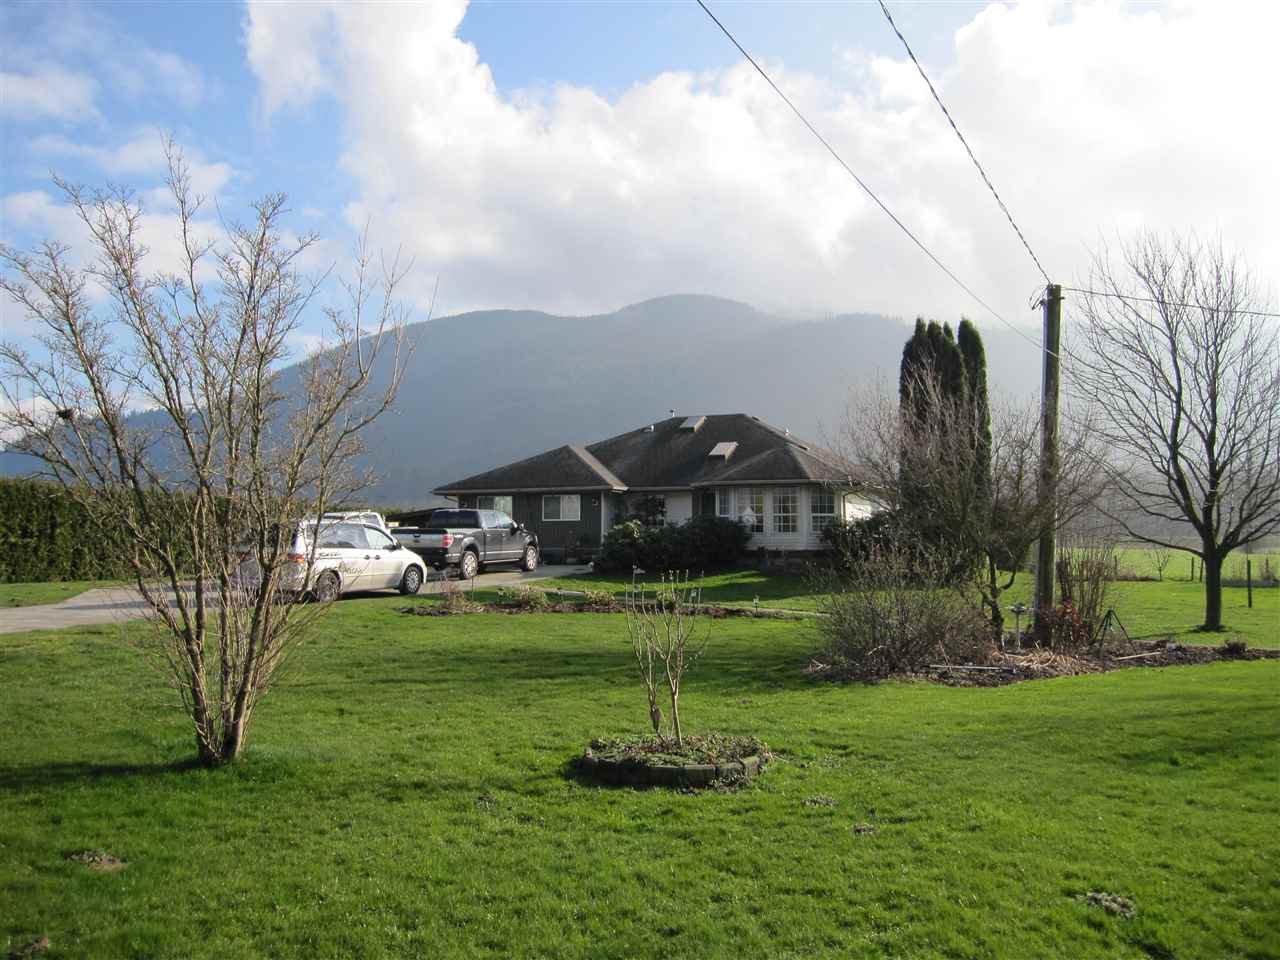 Main Photo: 38806 NICOMEN ISLAND TRUNK Road in Mission: Dewdney Deroche House for sale : MLS®# R2041213